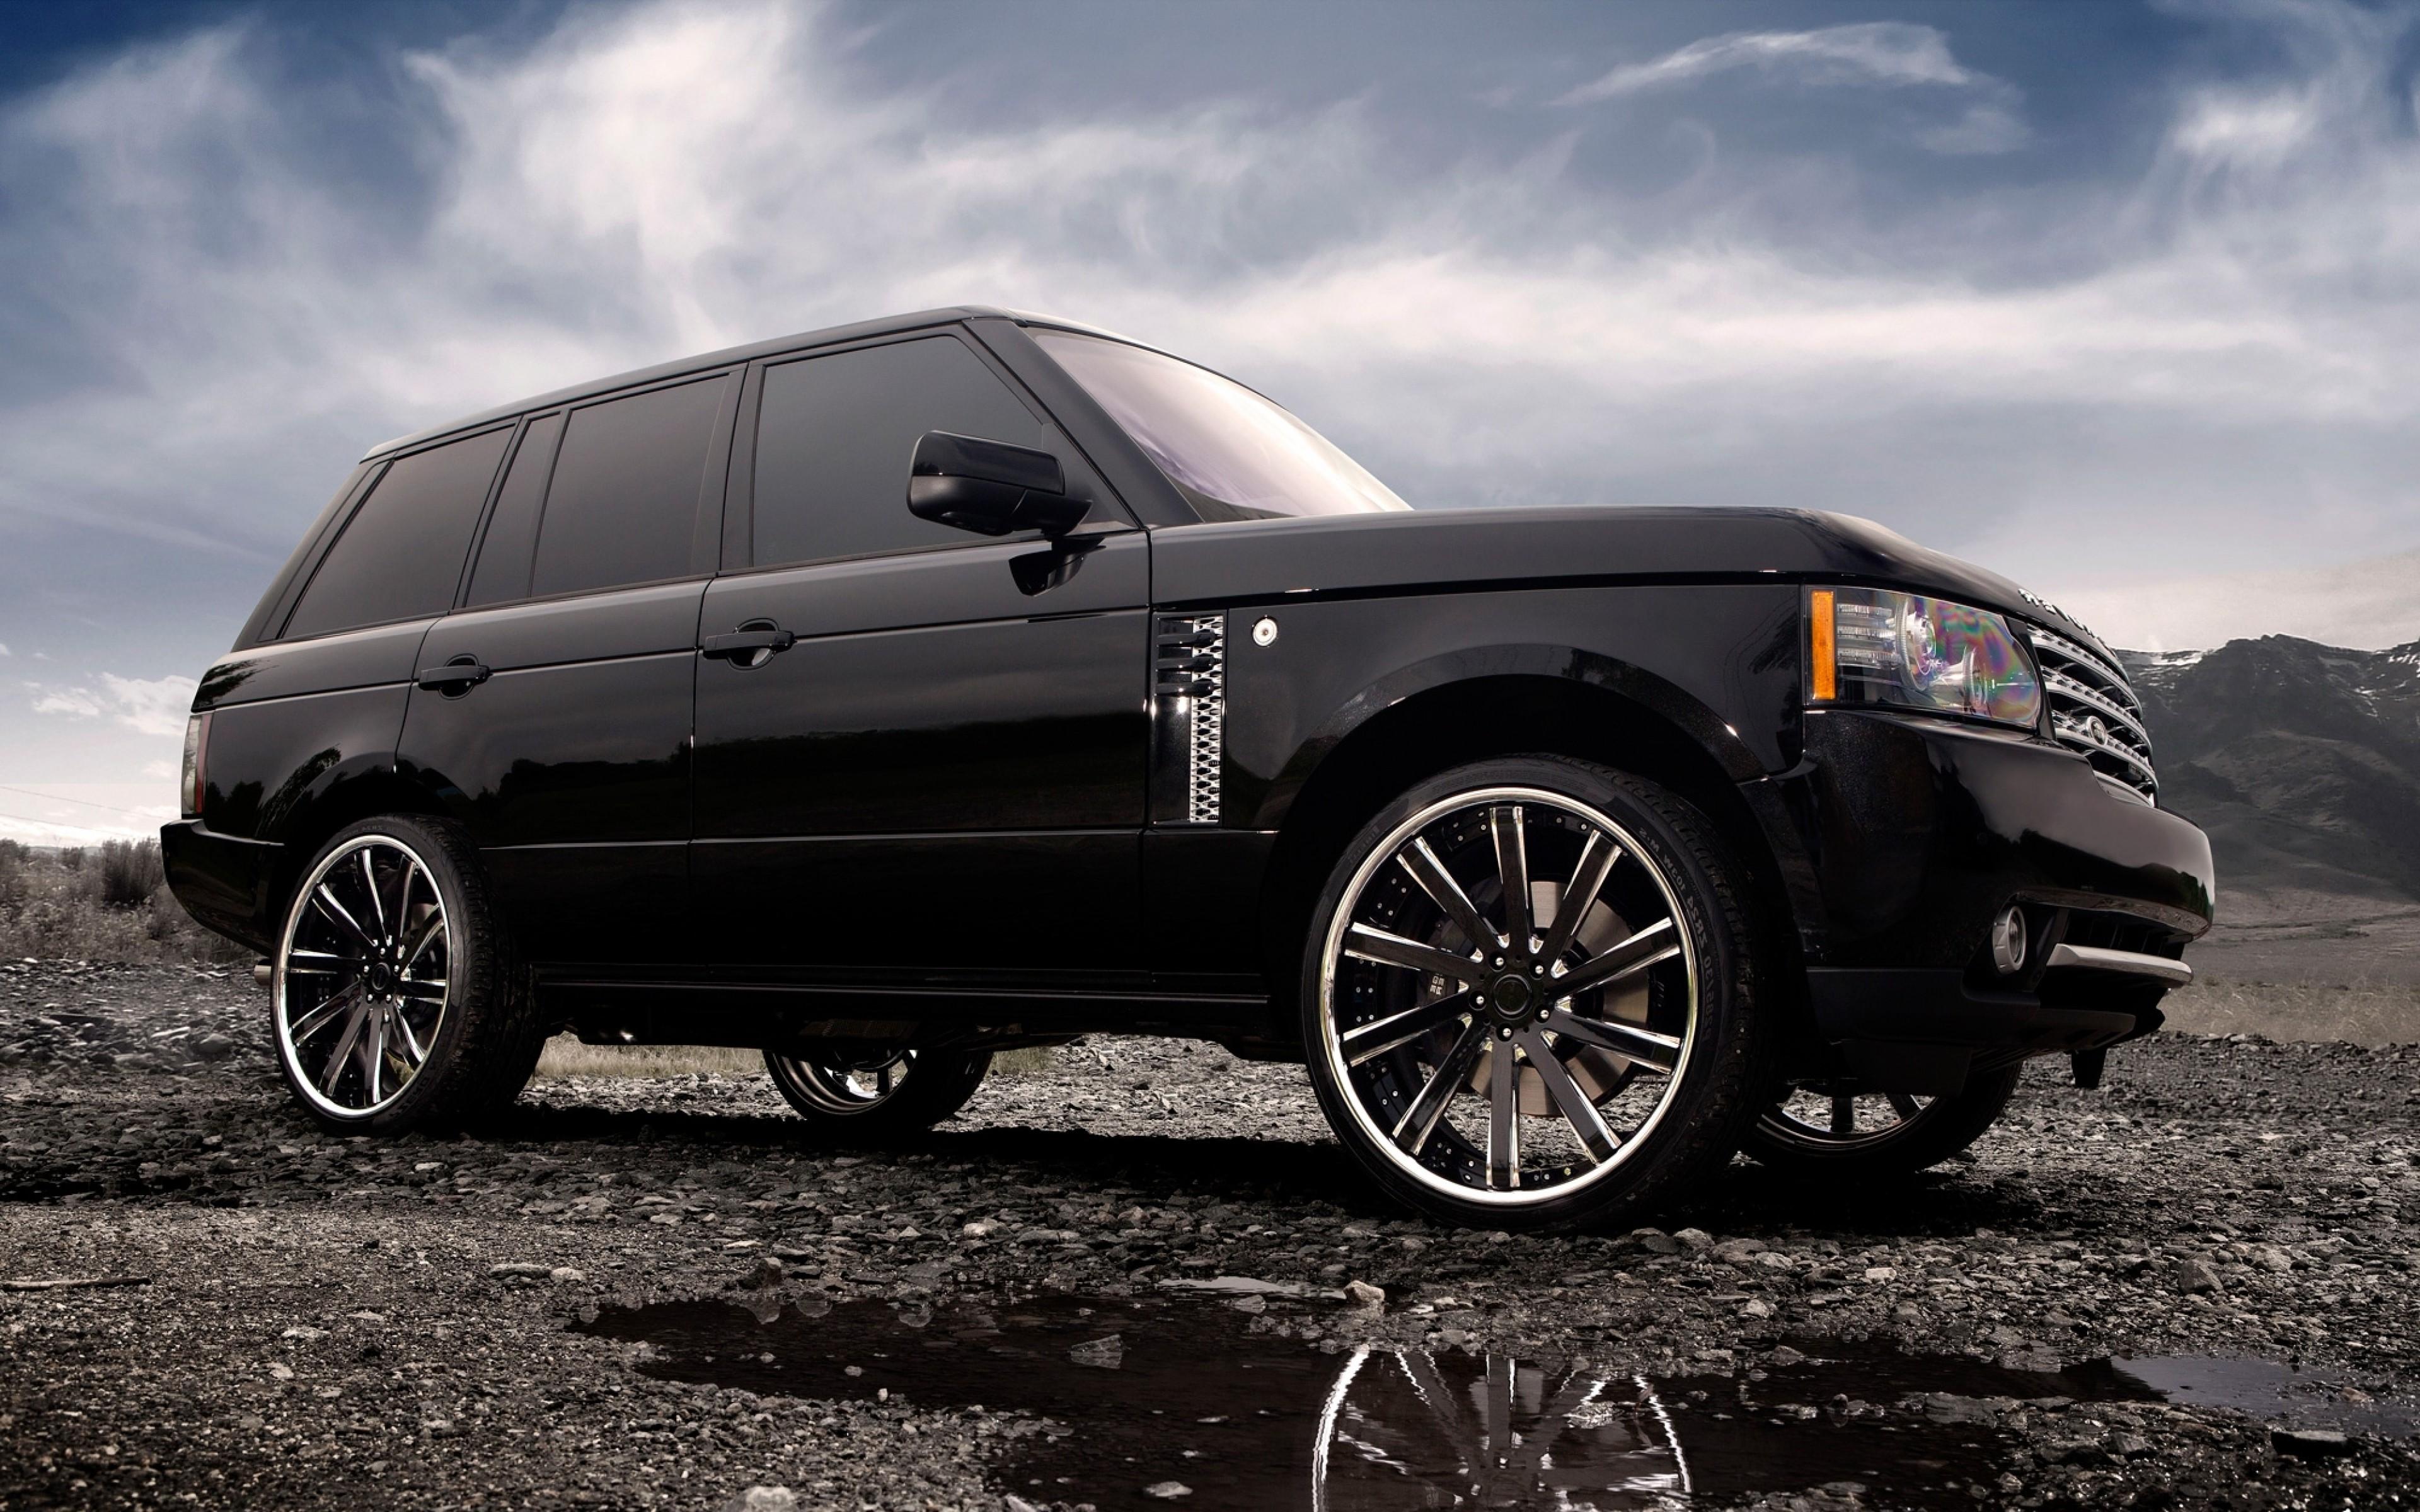 Download Logo Range Rover Hd: 2048x2048 Range Rover Tuned Wheels Black Ipad Air HD 4k